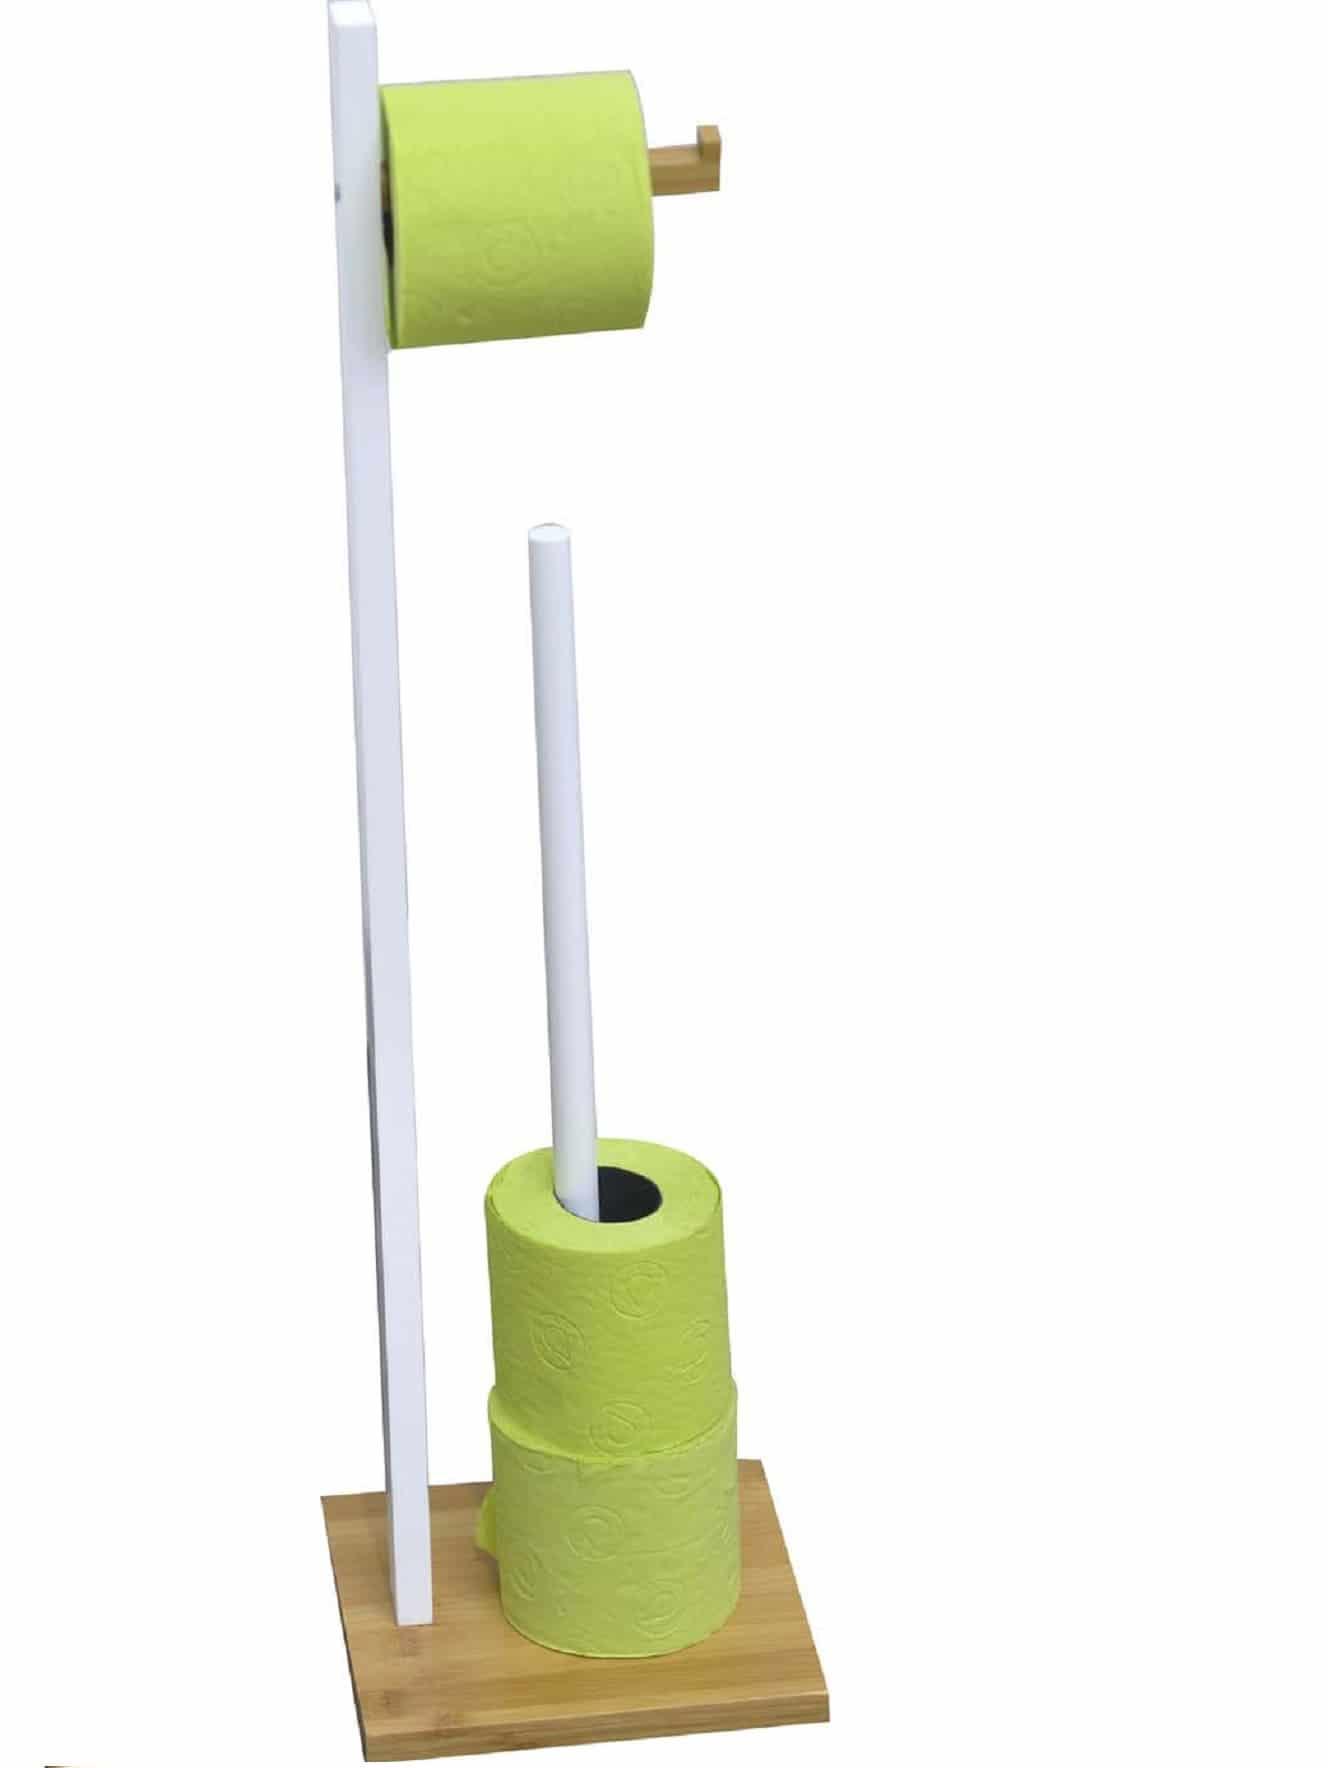 Bamboe Toiletrolhouder met Reserverolhouder - 19x19x71 cm - Wit/Bruin